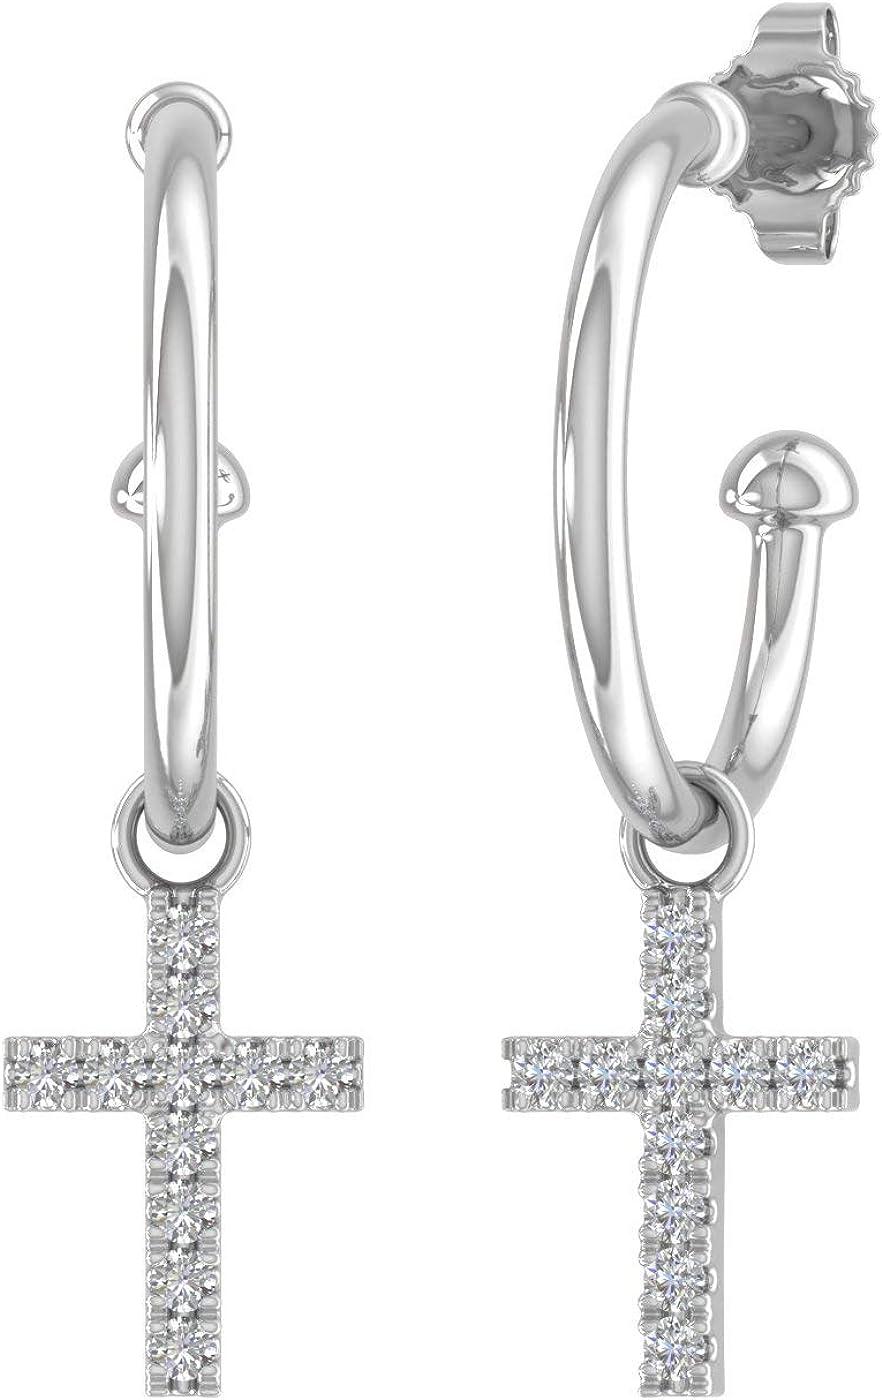 10K Solid Gold Diamond Hoop Soldering Cross Earrings Carat 0.12 Portland Mall With